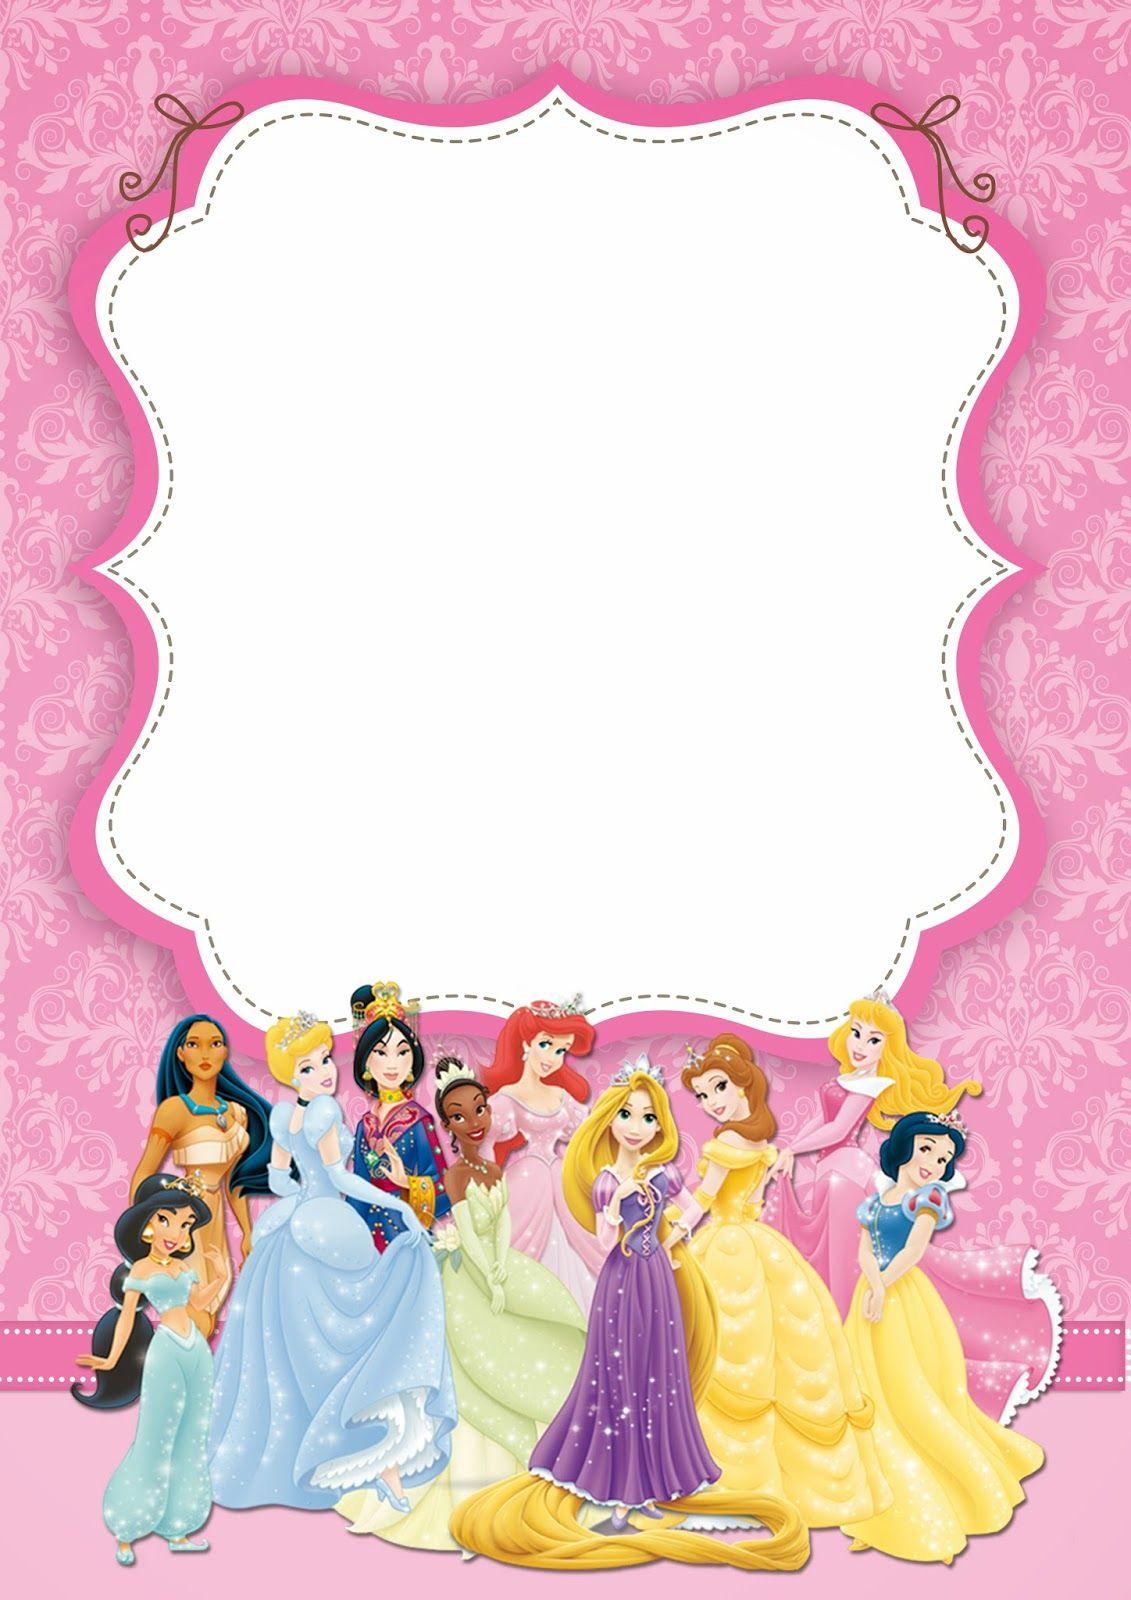 Disney Princess: Free Printable Party Invitations. | Princesse - Disney Princess Free Printable Invitations